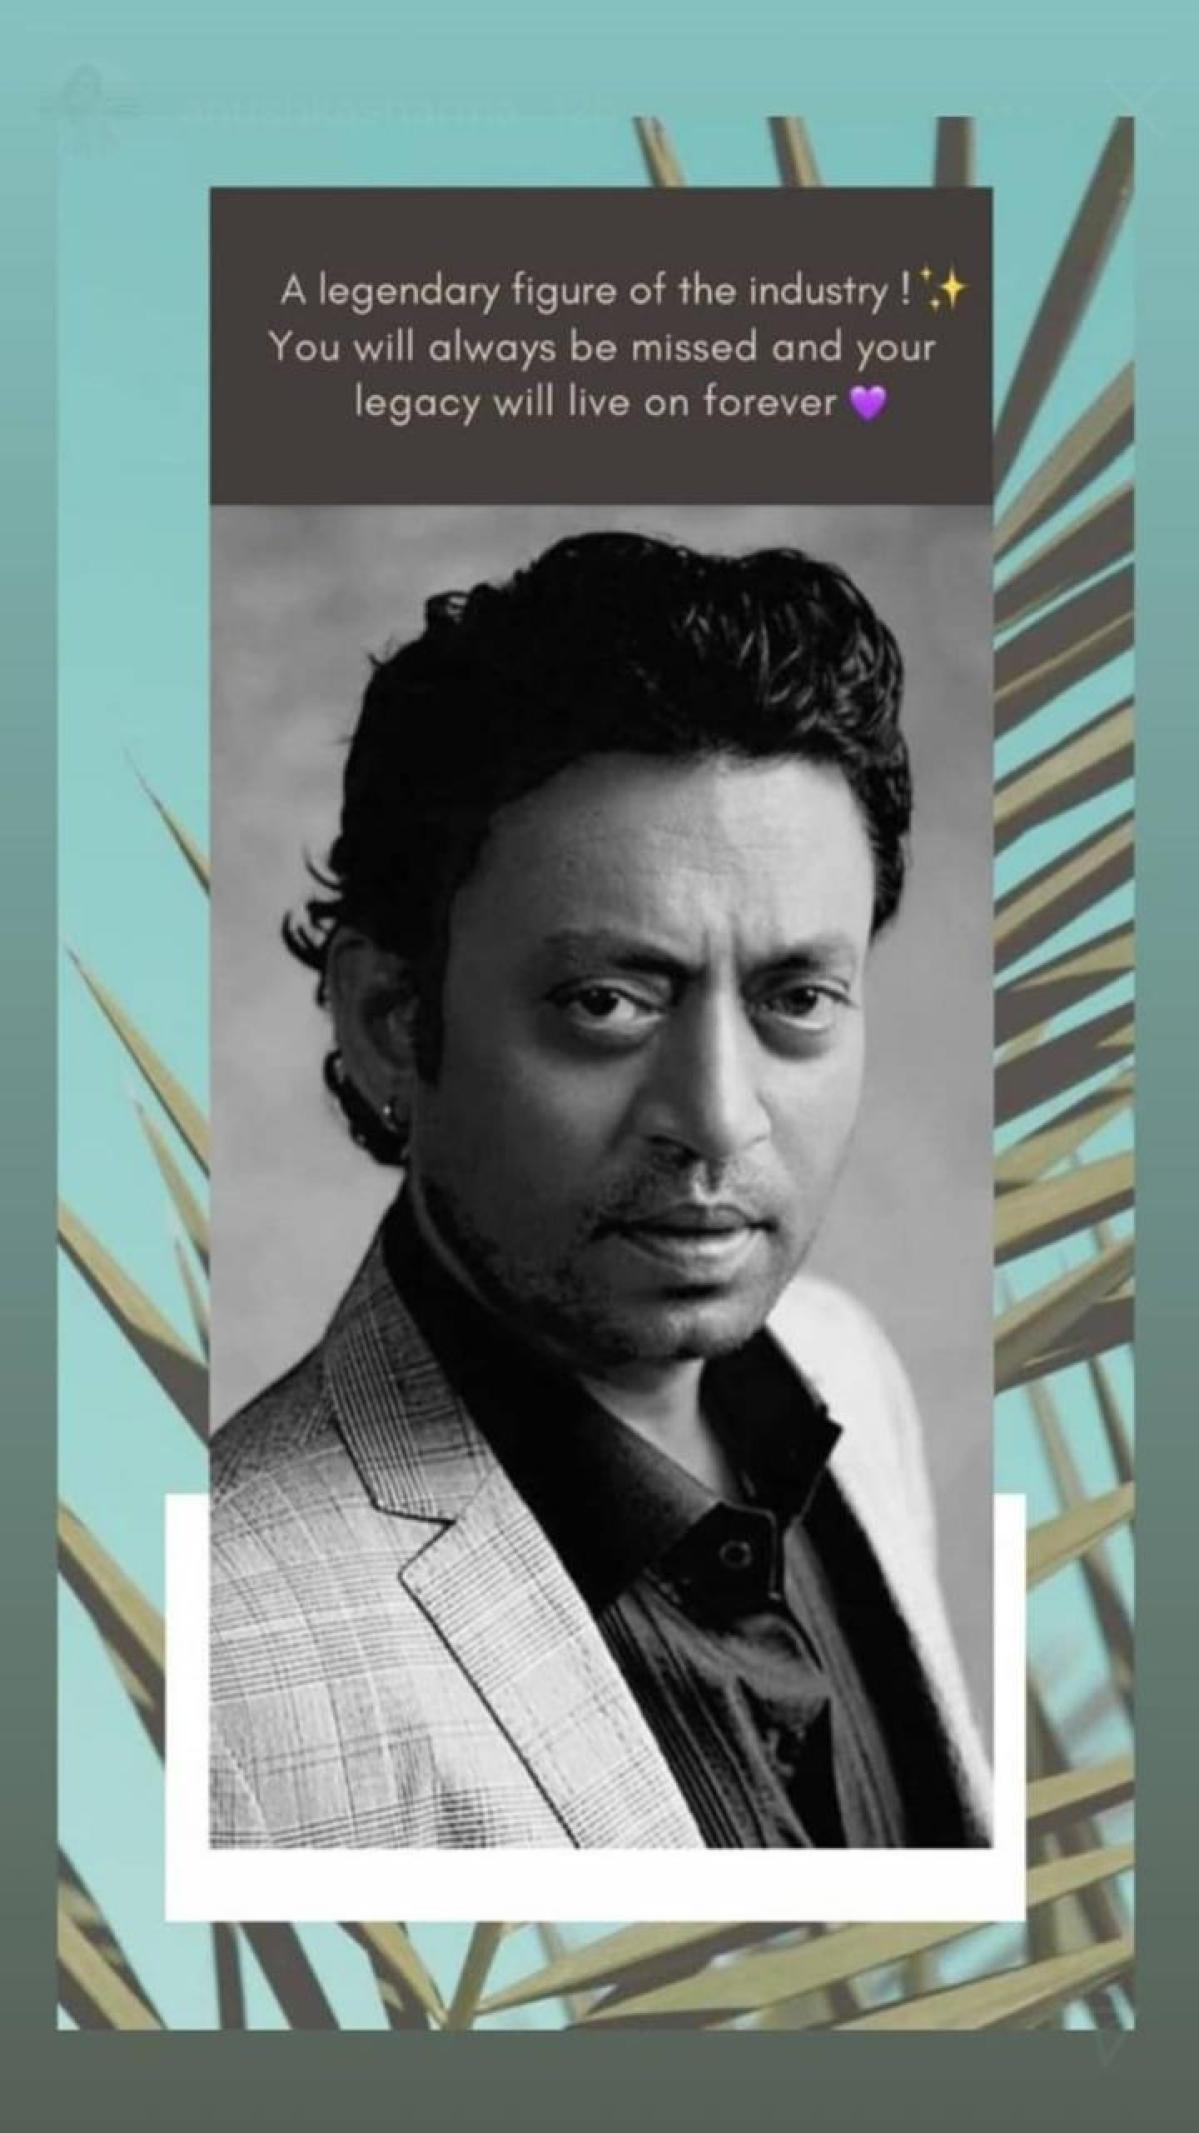 Irrfan Khan birth anniversary: Ayushmann Khurrana, Anushka Sharma and others remember the late star